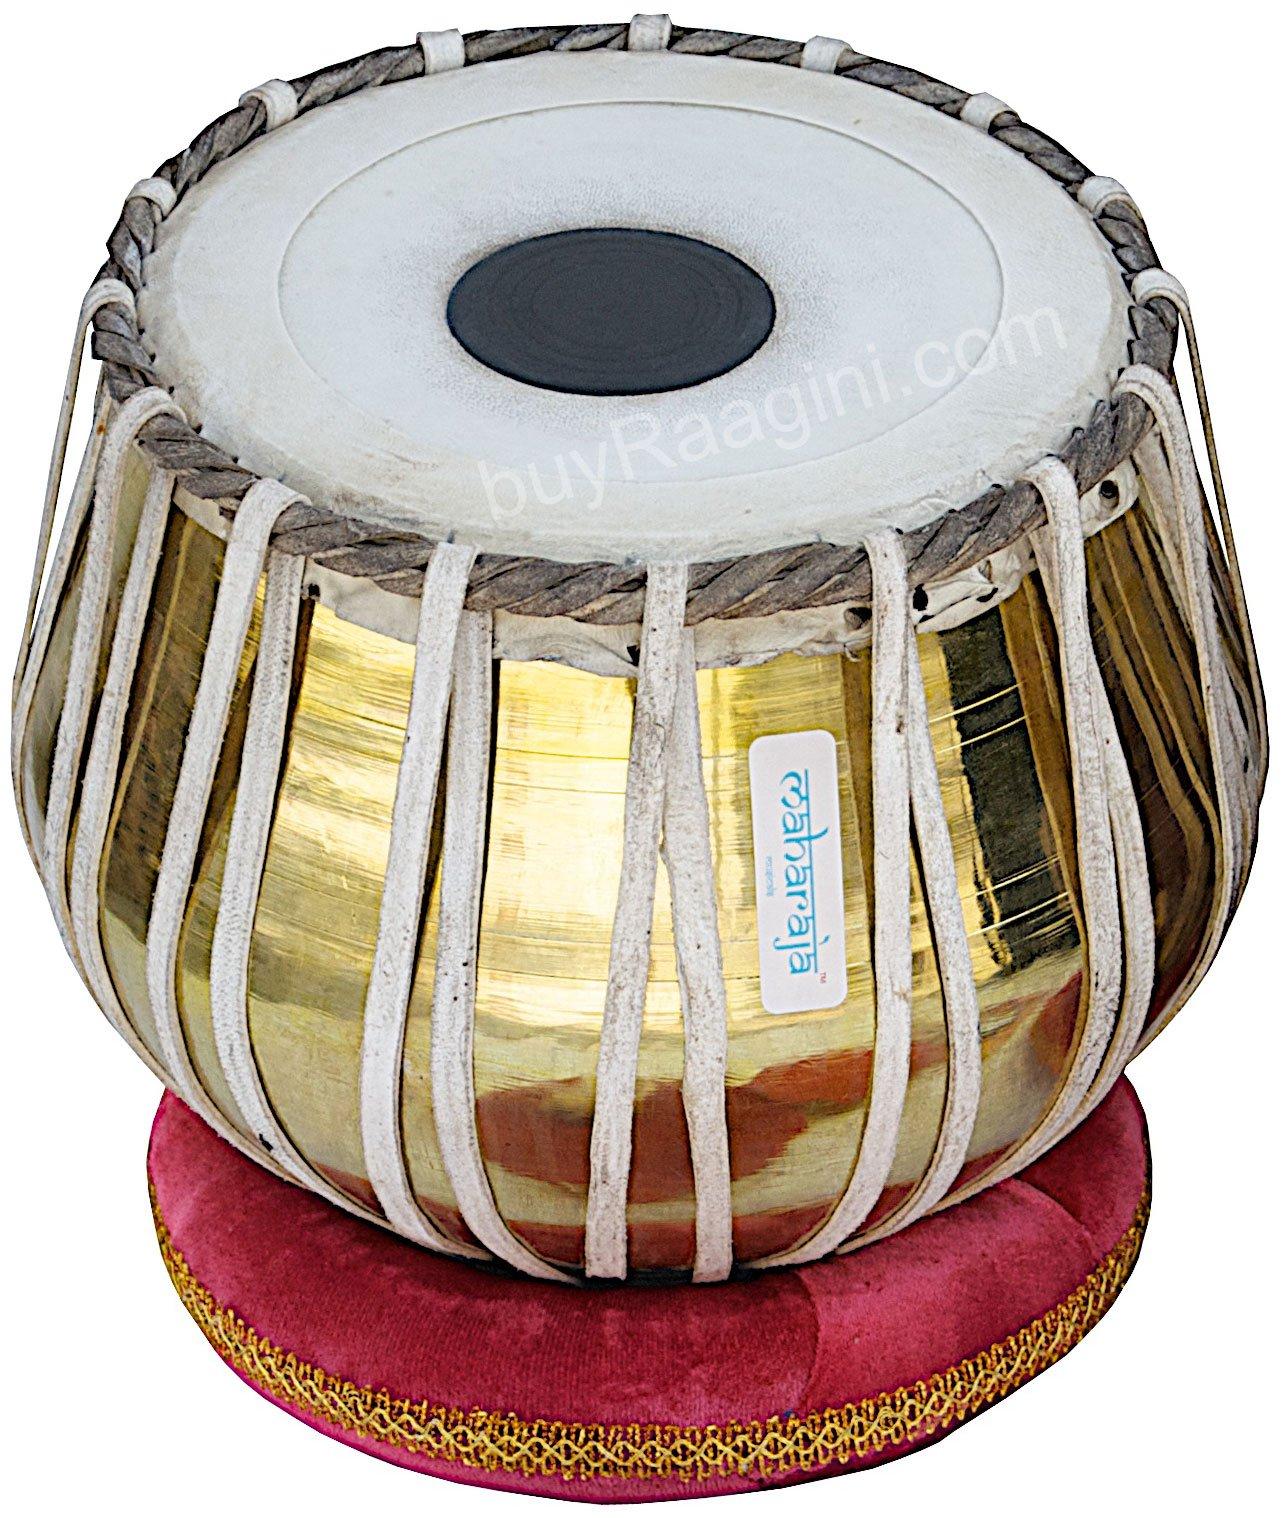 Tabla Set by Maharaja Musicals, Golden Brass Bayan 3Kg, Sheesham Dayan Tabla, Nylon Bag, Hammer, Book, Cushions, Cover, Tabla Indian Drums (PDI-CH) by Maharaja Musicals (Image #3)